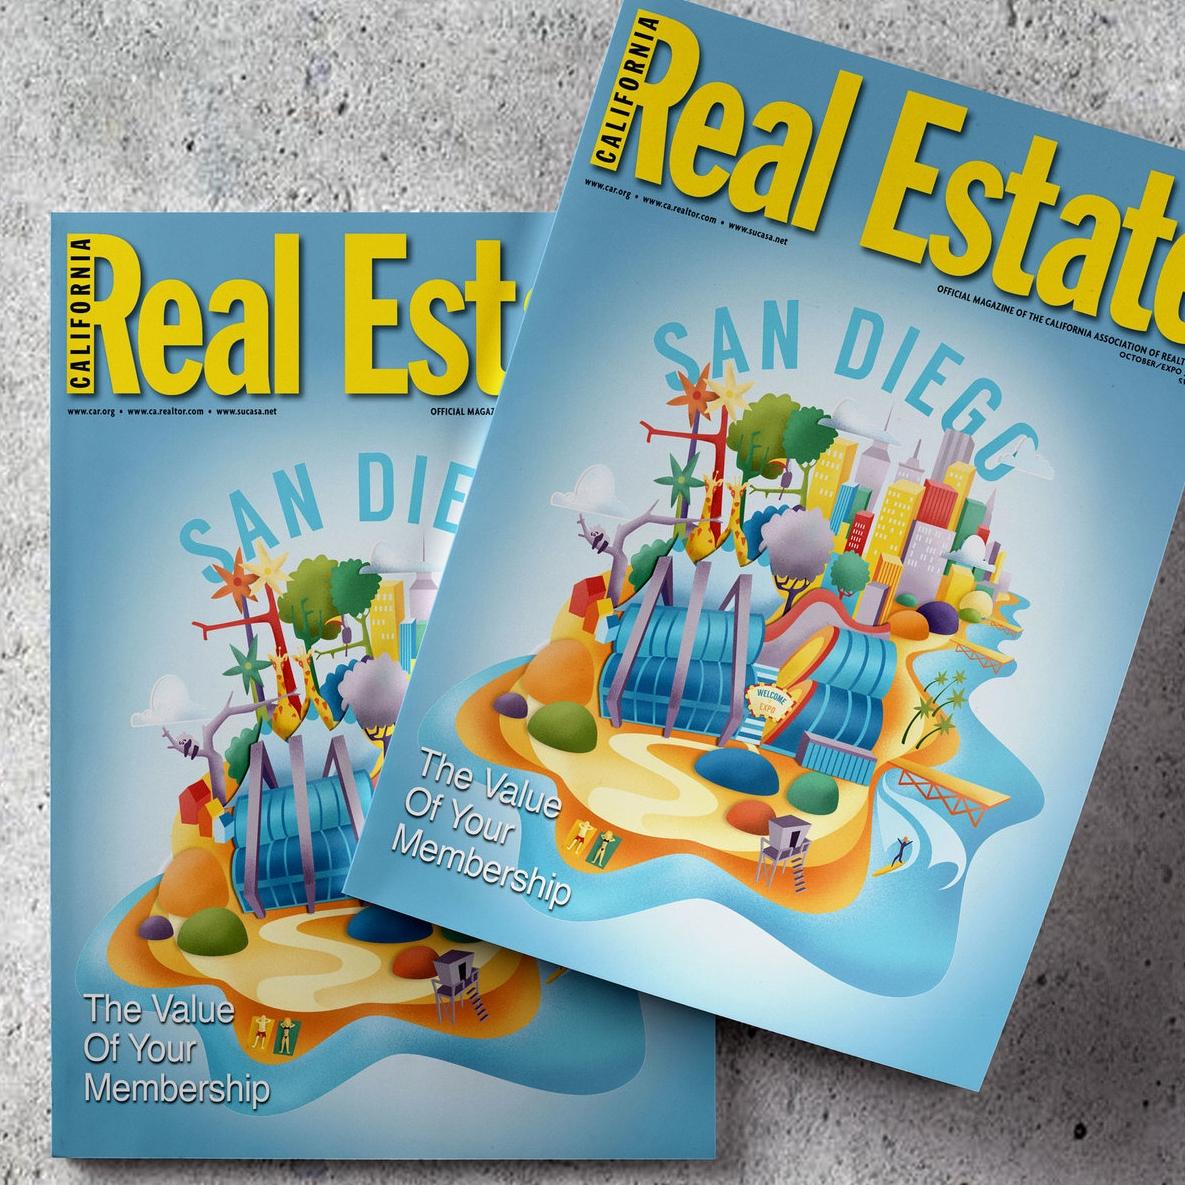 Illustration - Editorial, Print and Web